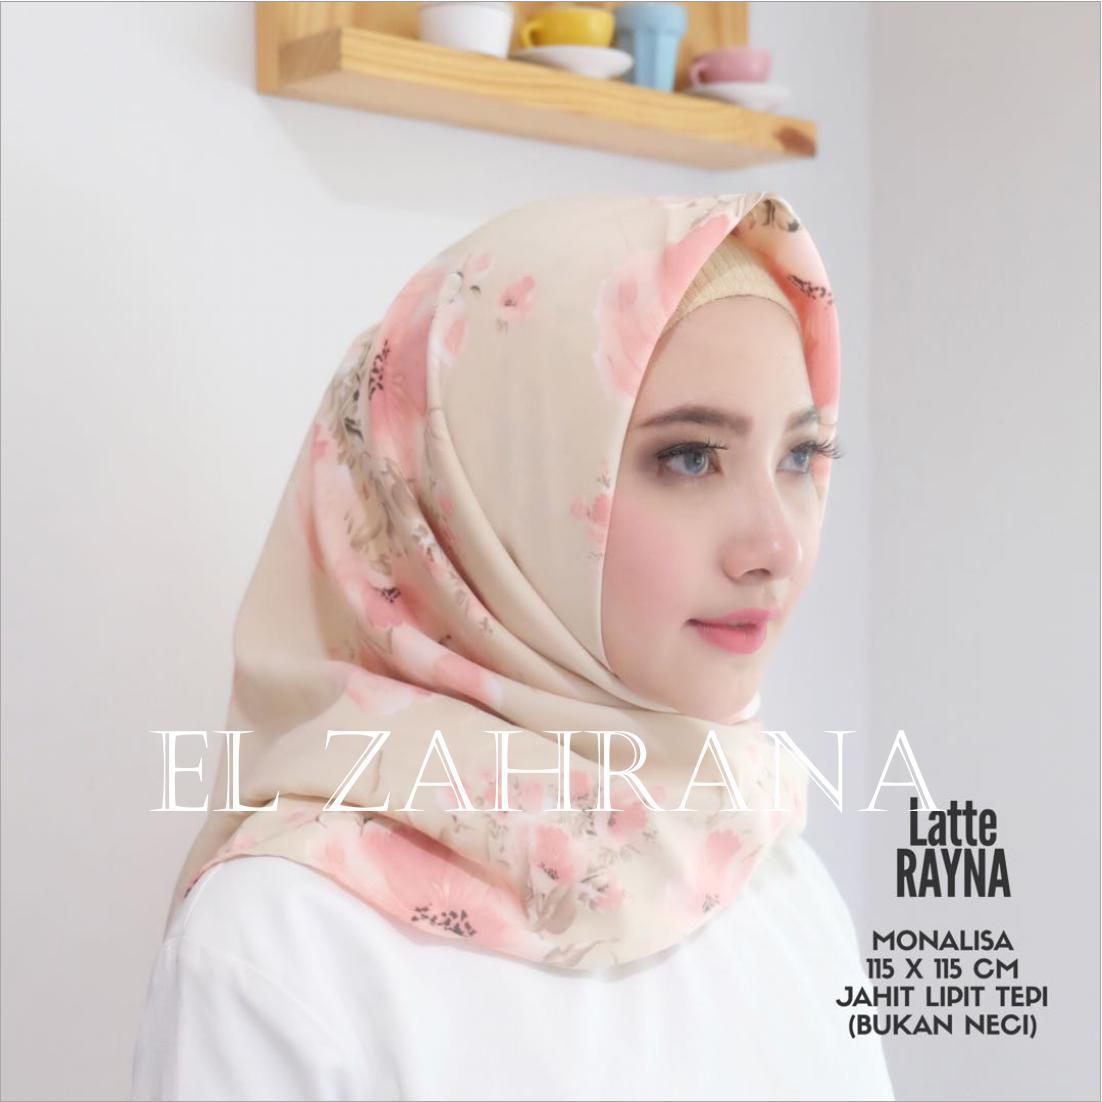 Model El Zahrana Hijab Square Kerudung Segi Empat Jilbab Motif Premium Monalisa Terbaru